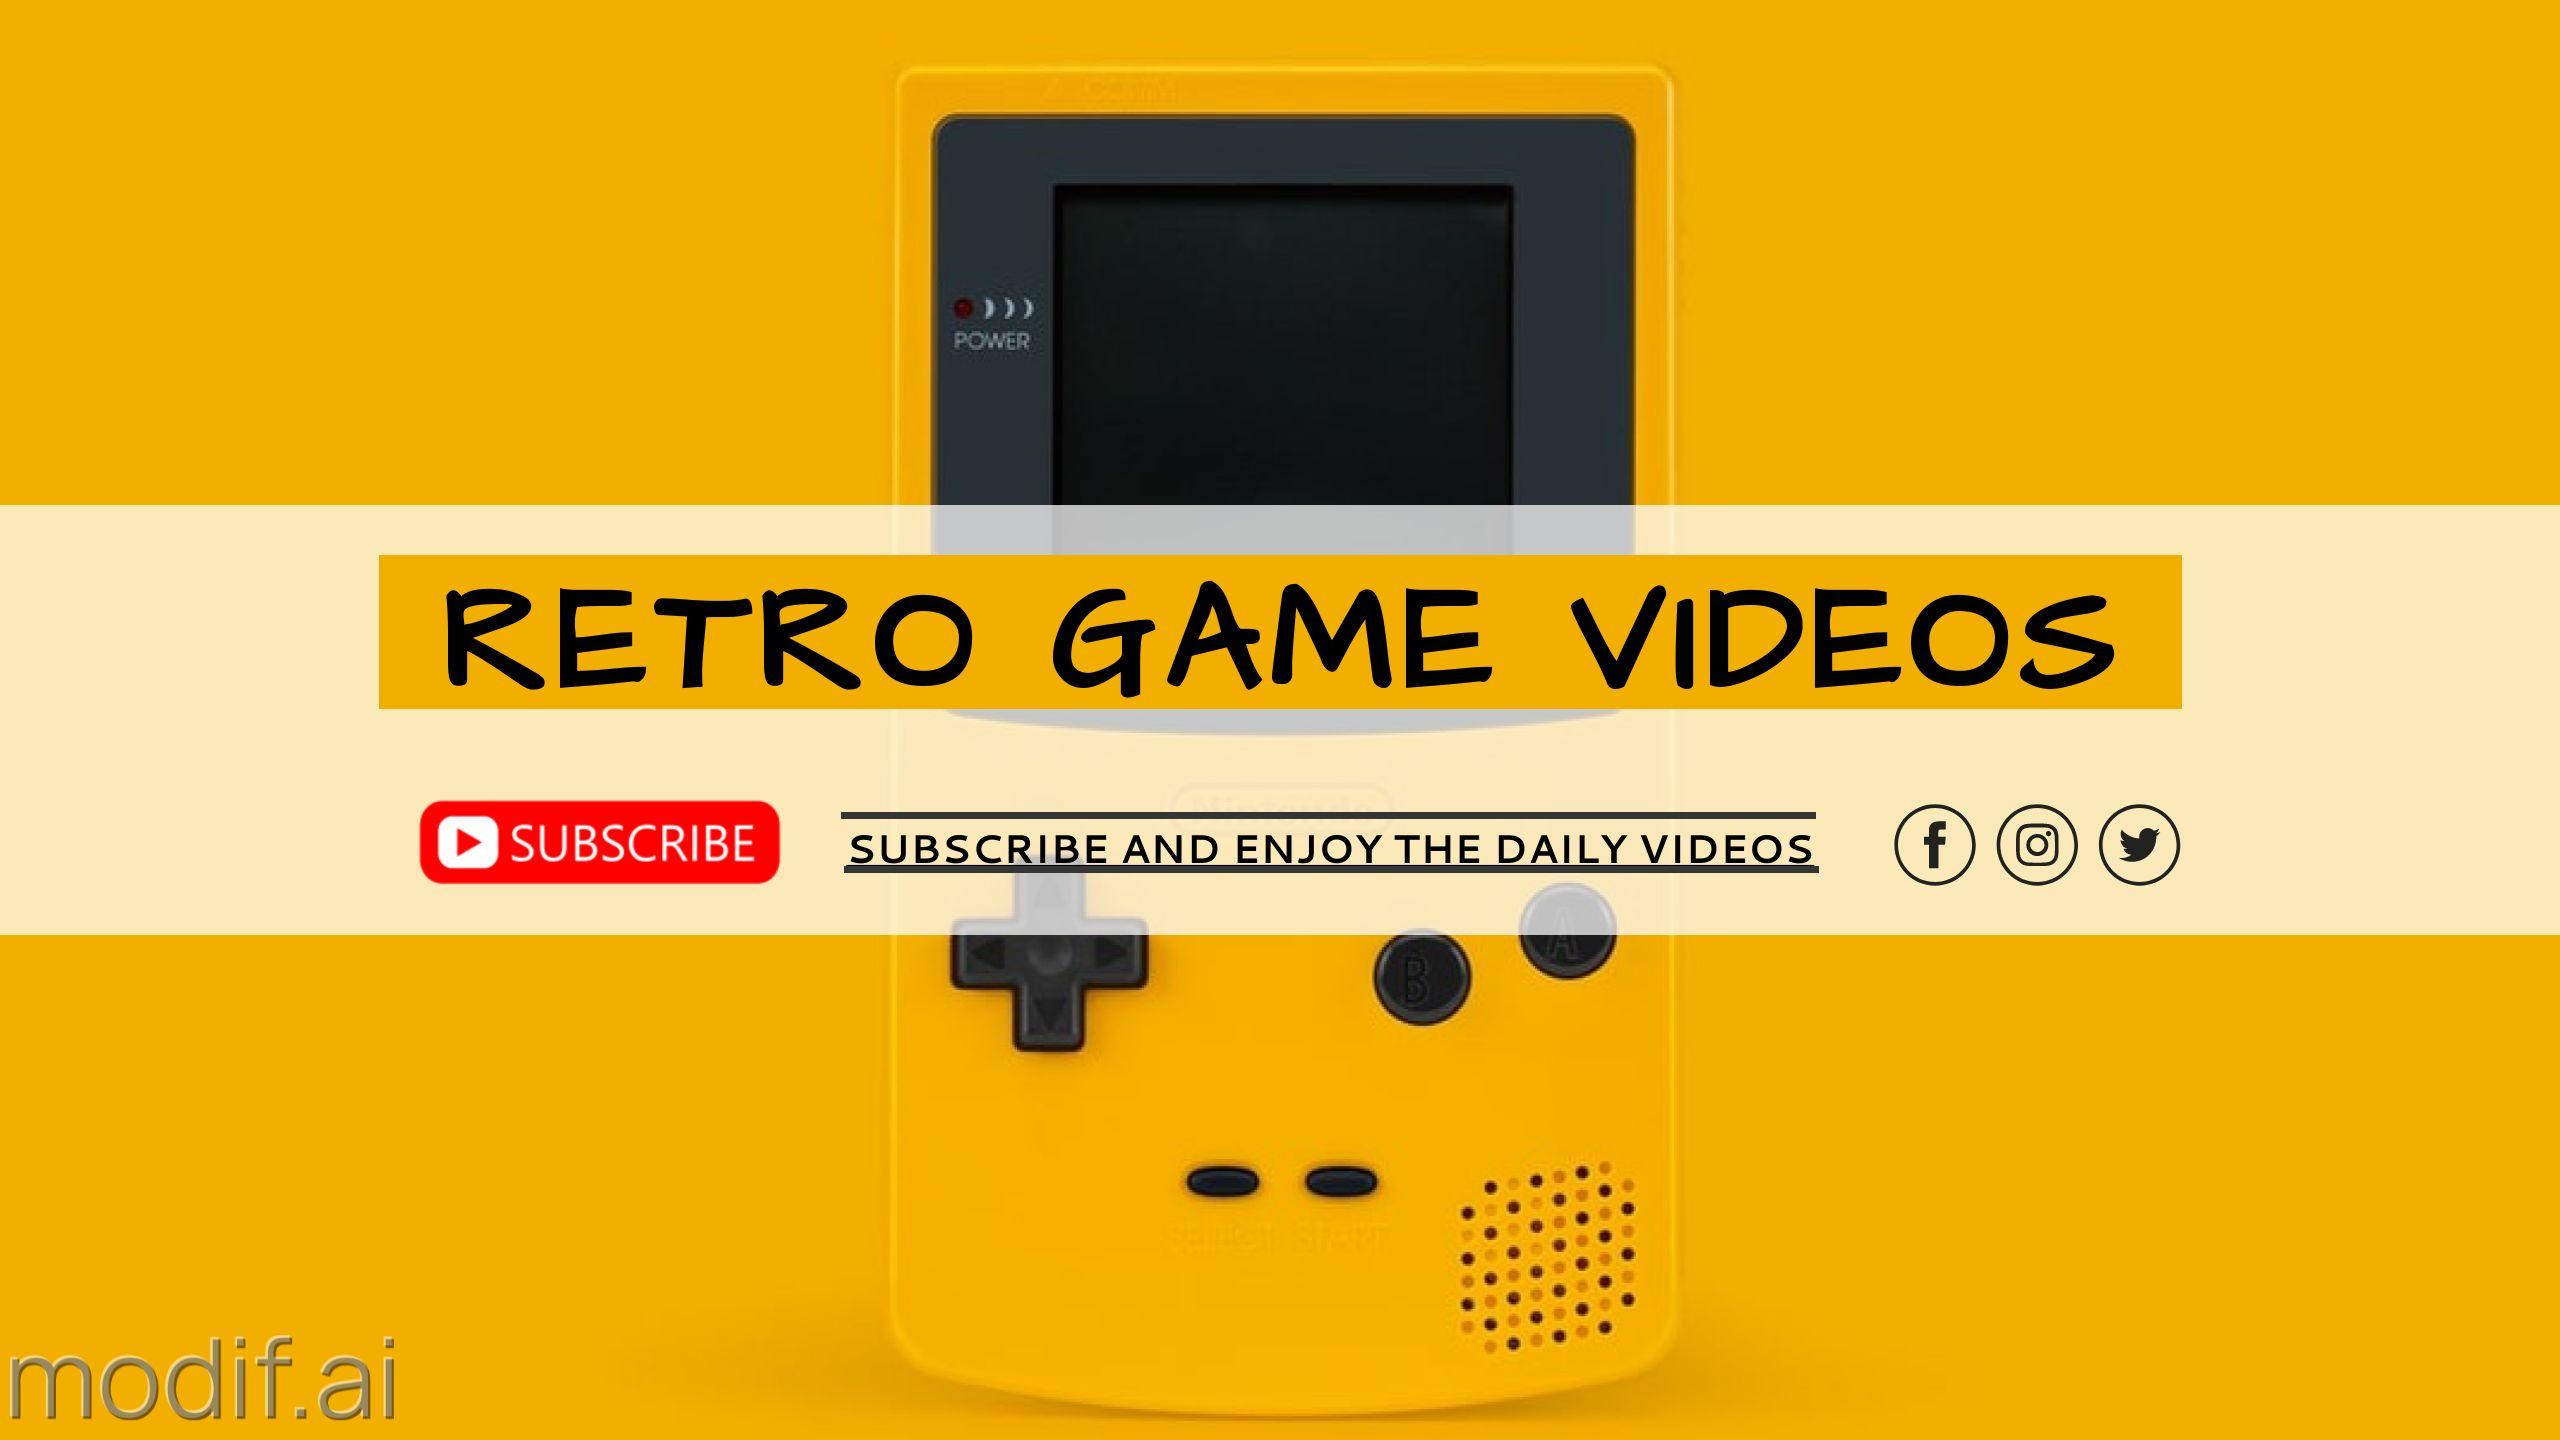 Retro Game Youtube Channel Art